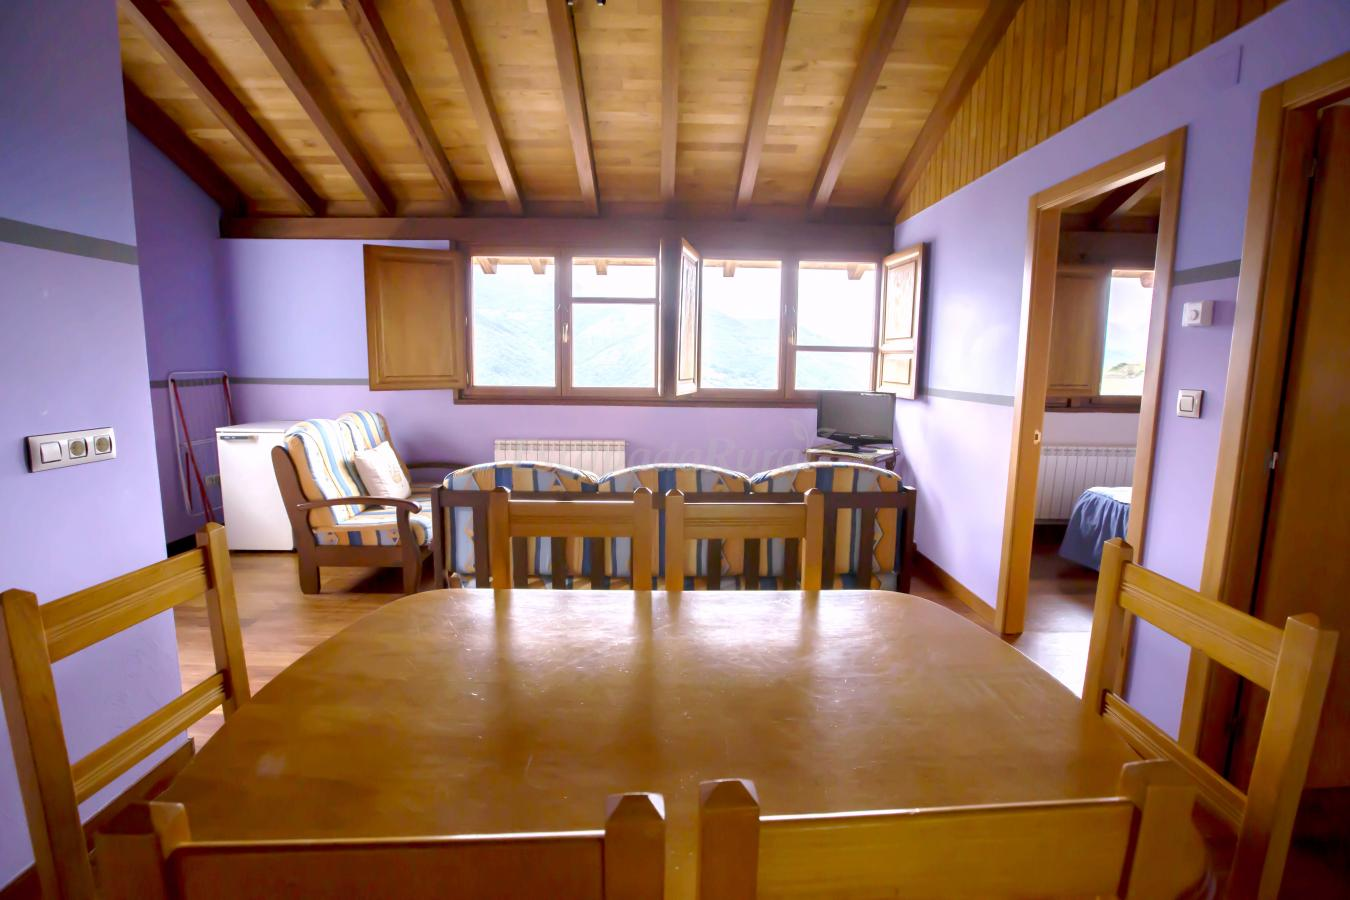 Apartamentos asturias casa rural en teverga asturias - Apartamentos baratos asturias ...